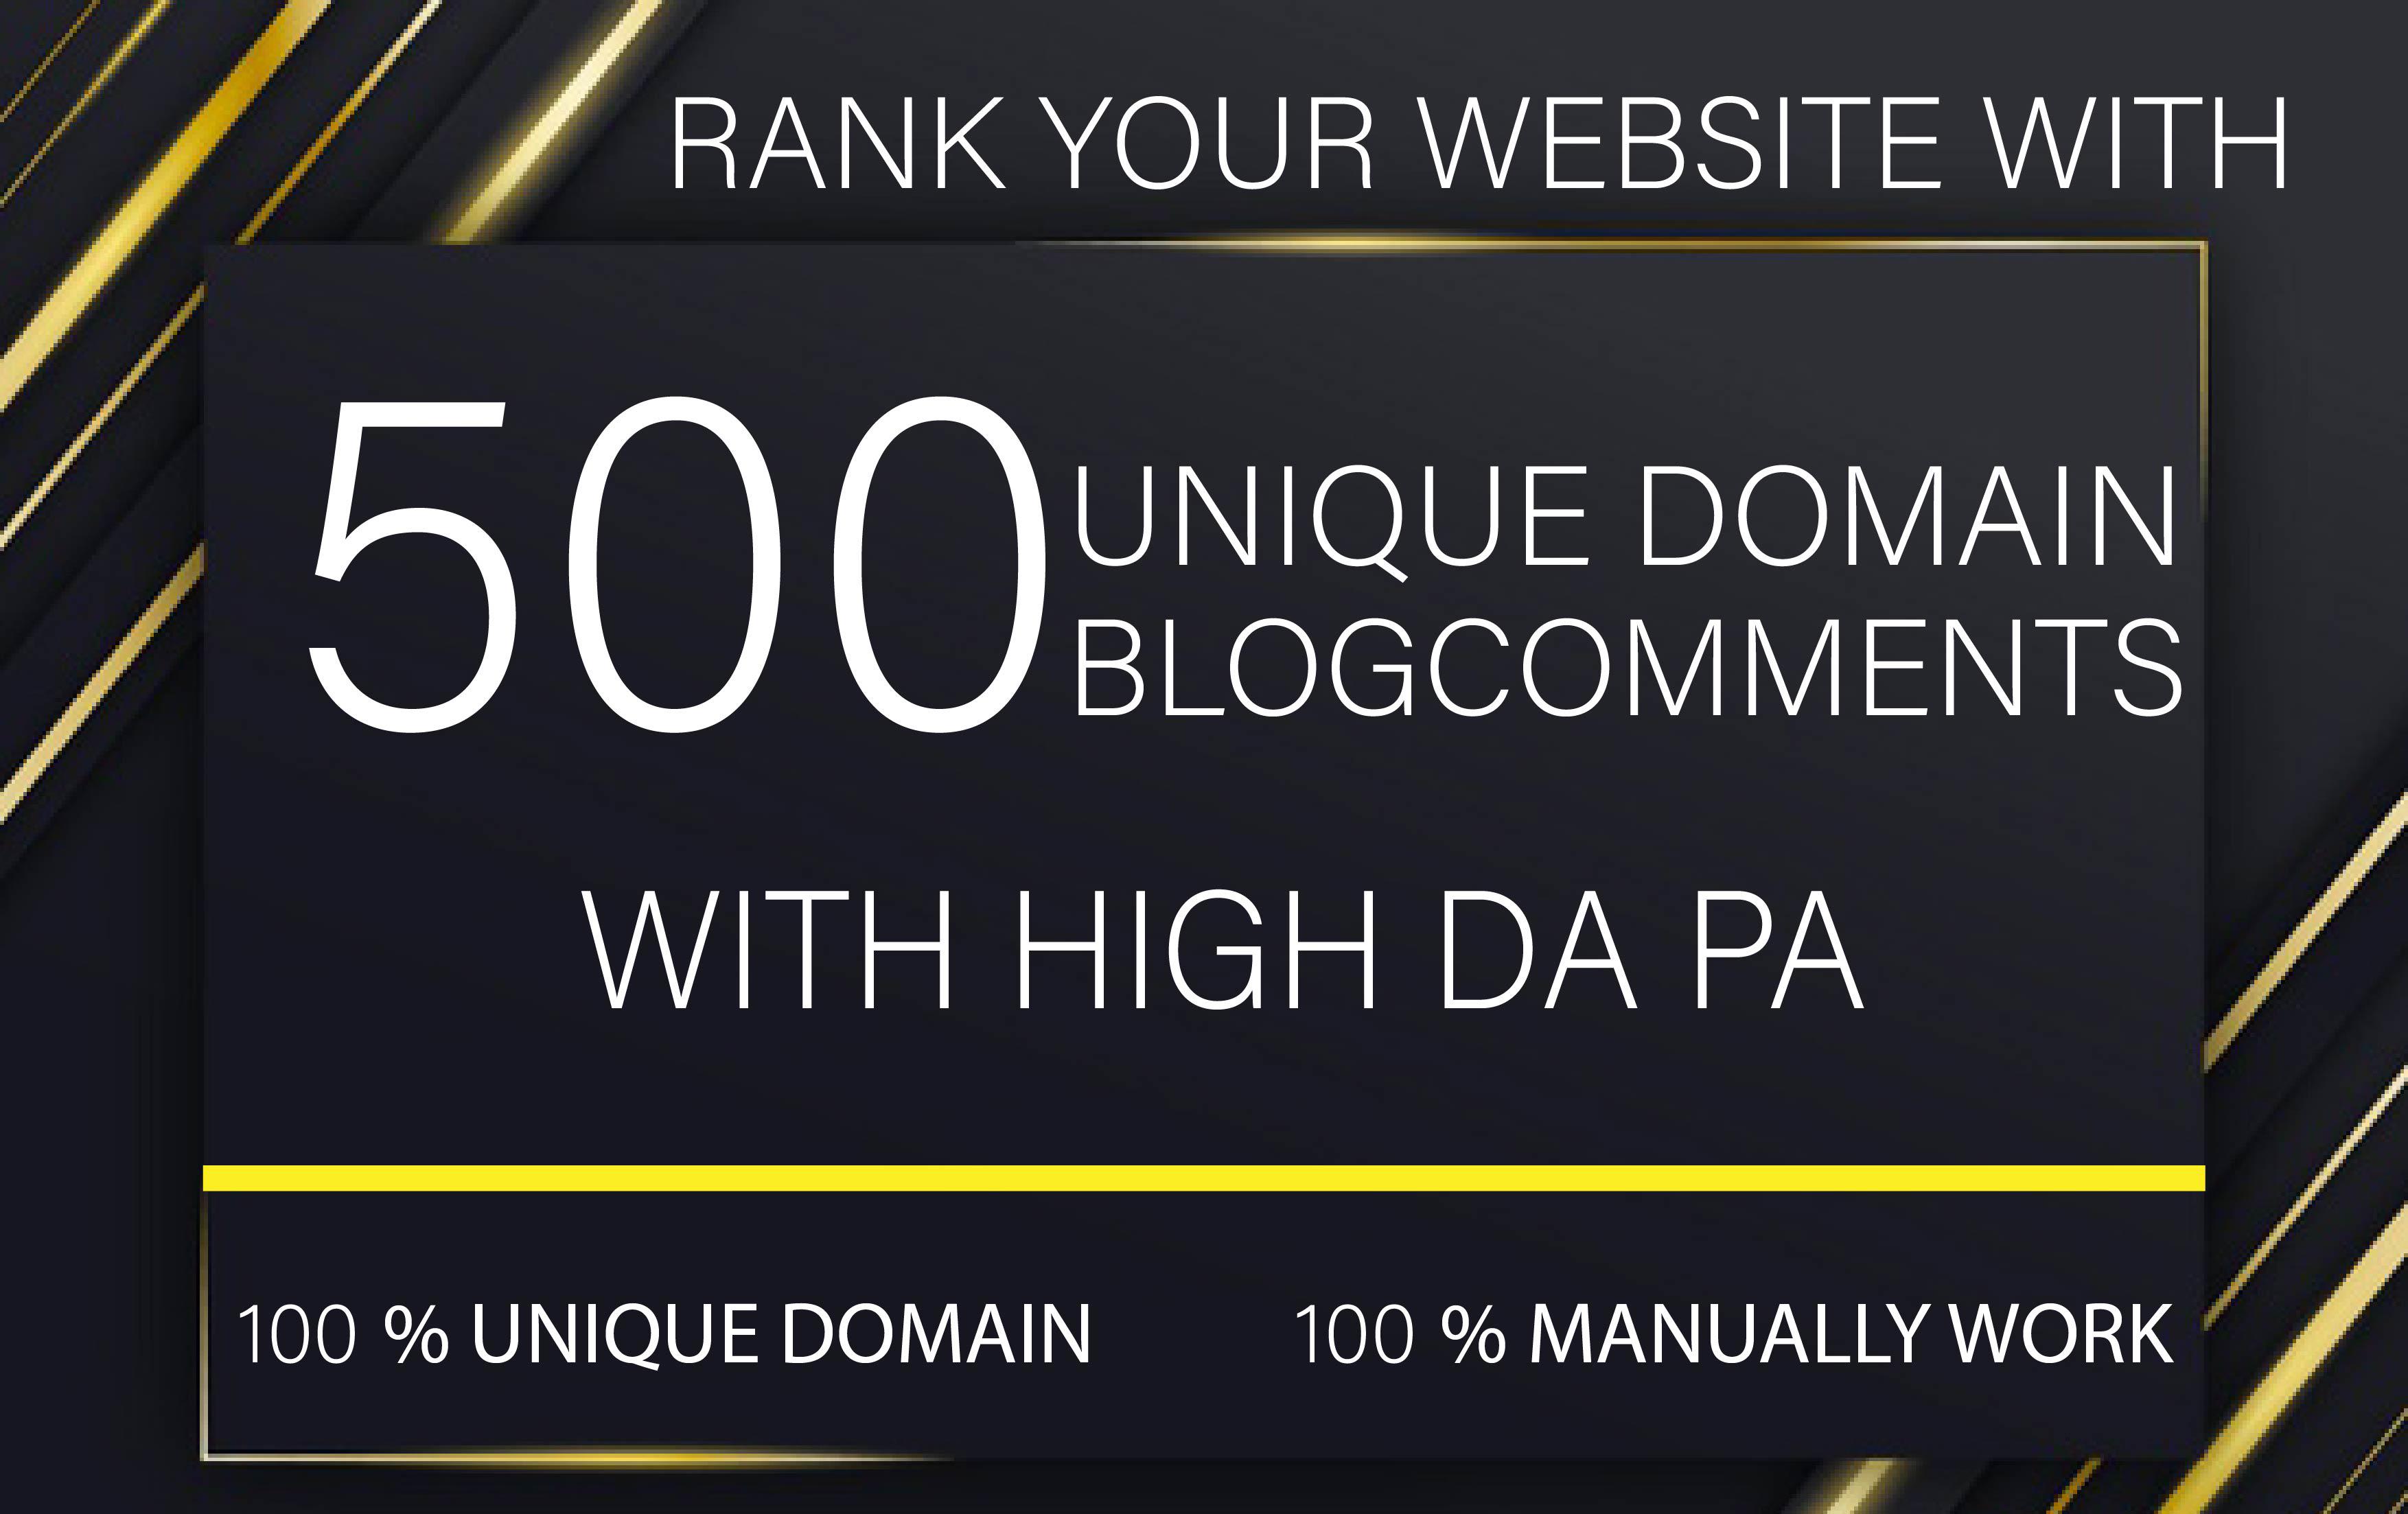 Create 500 unique domain blogcomments with high da pa